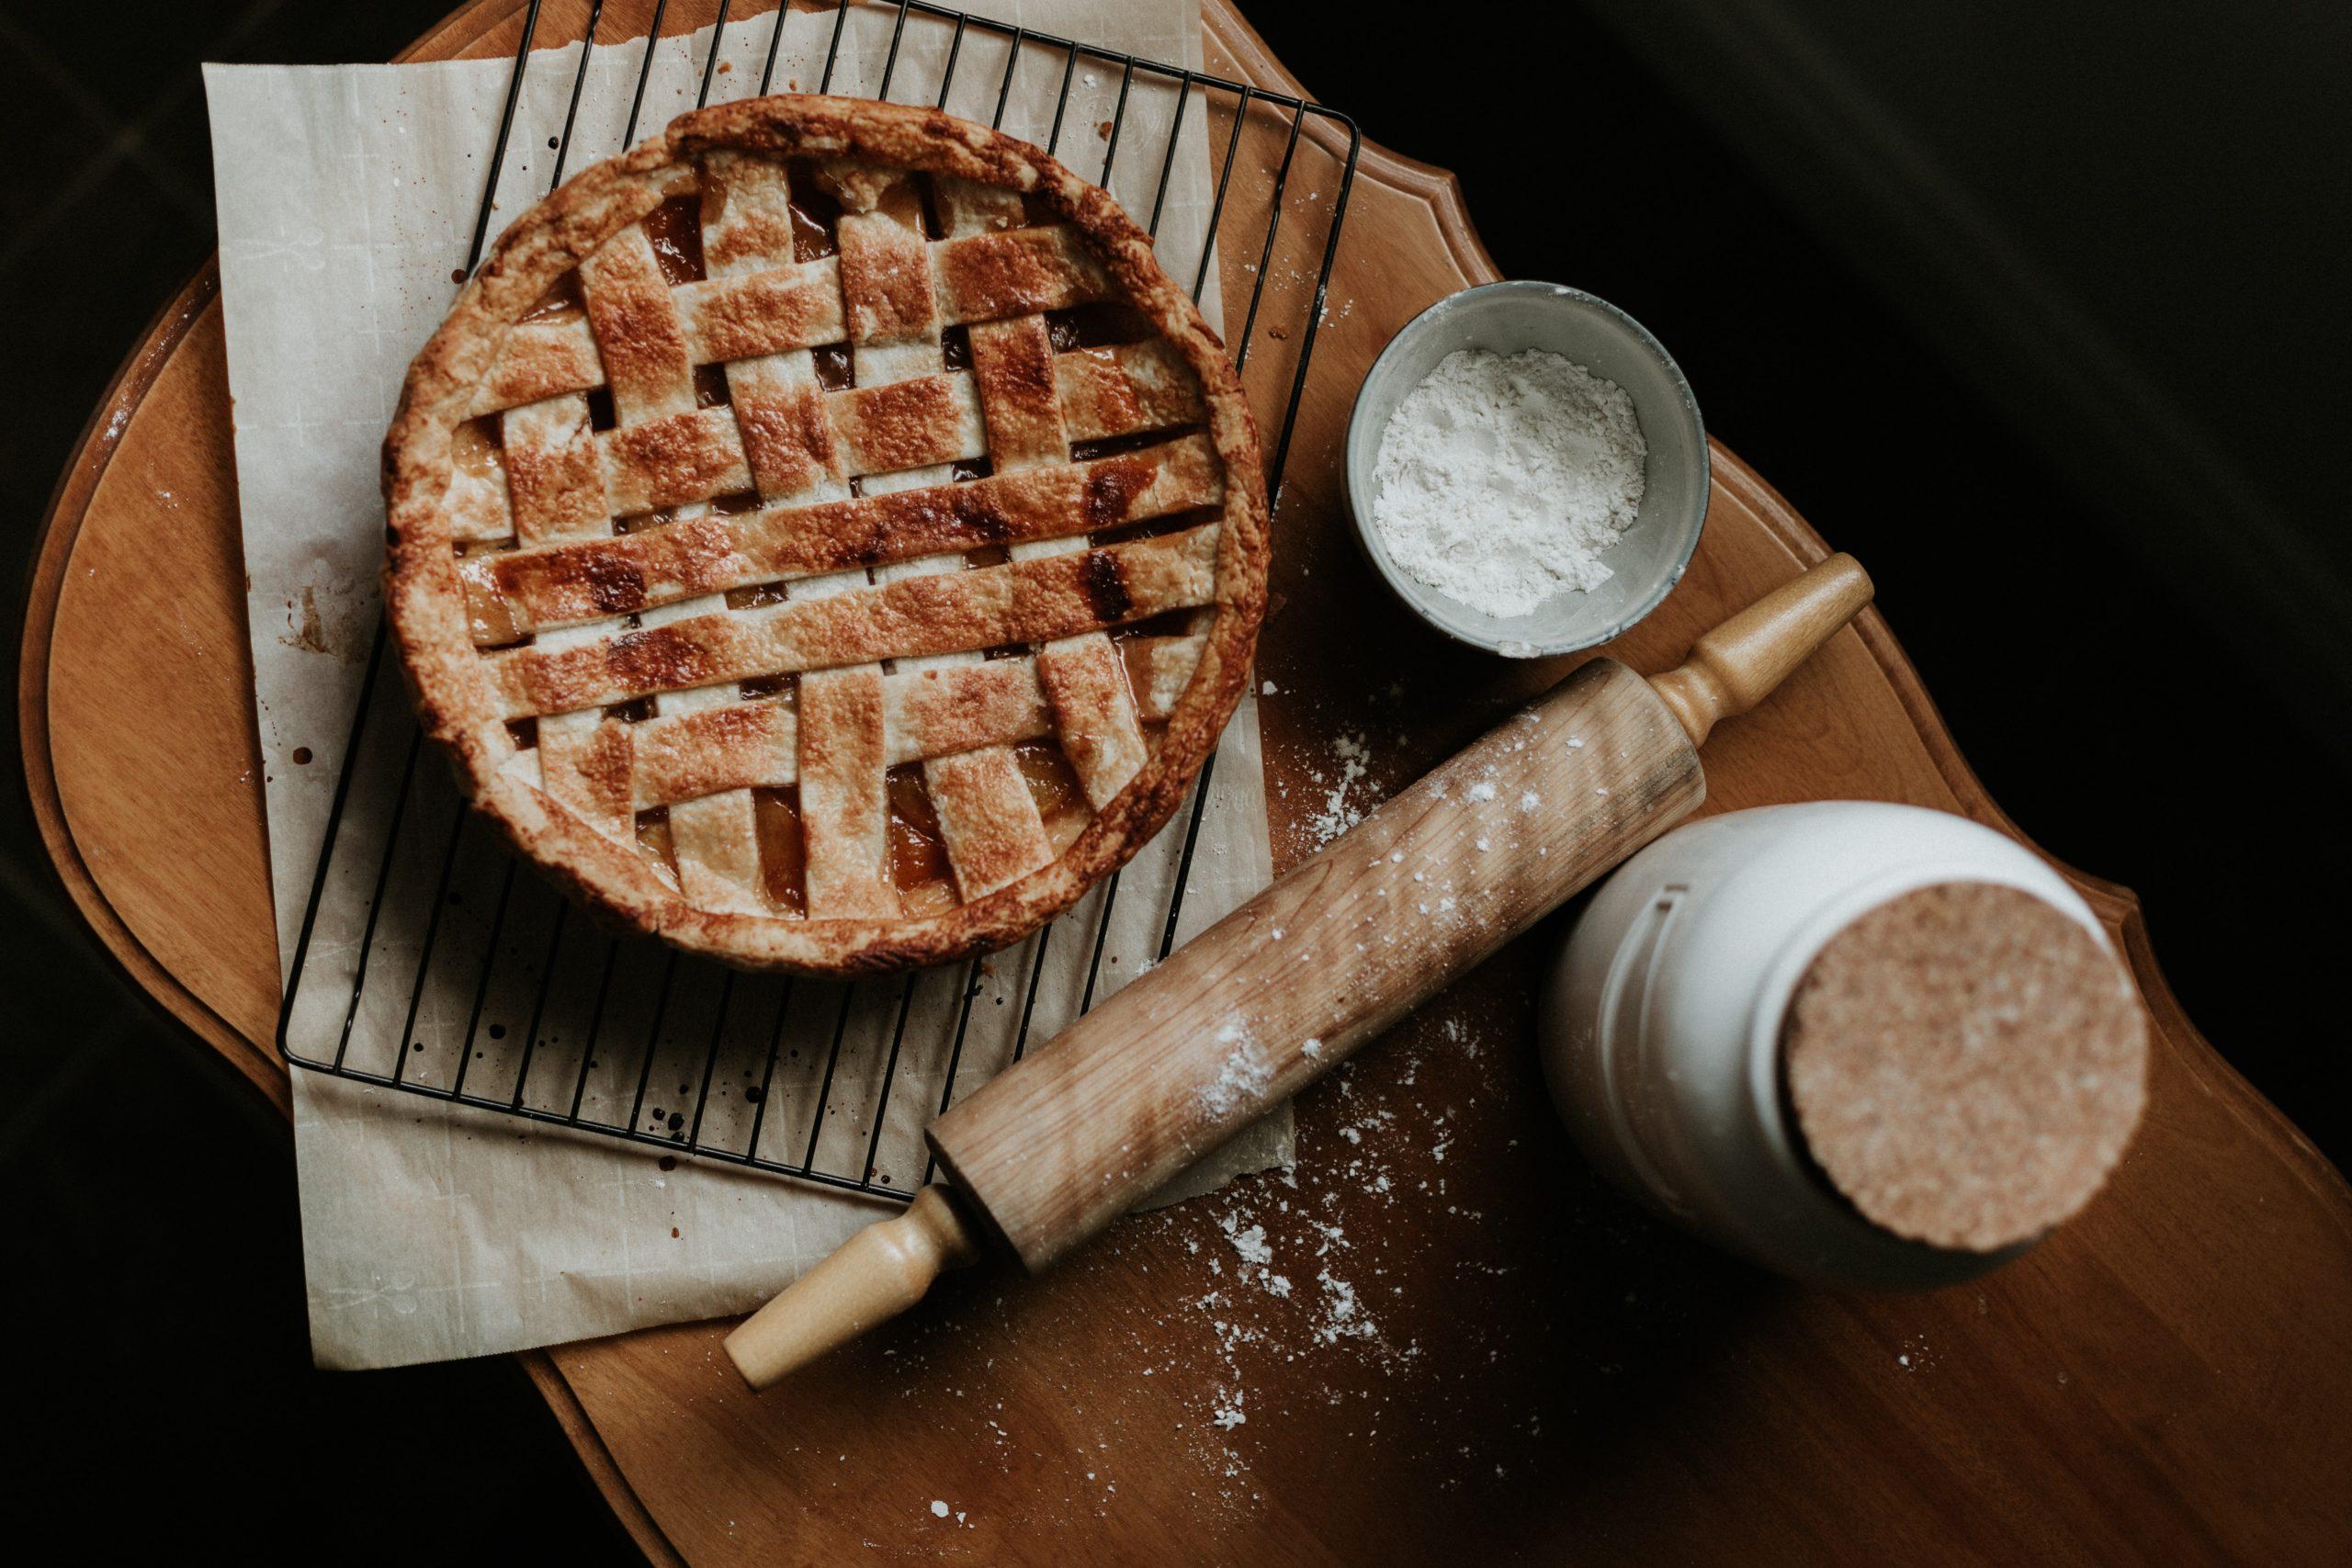 Apple Pie by Priscilla Du Preez via Unsplash